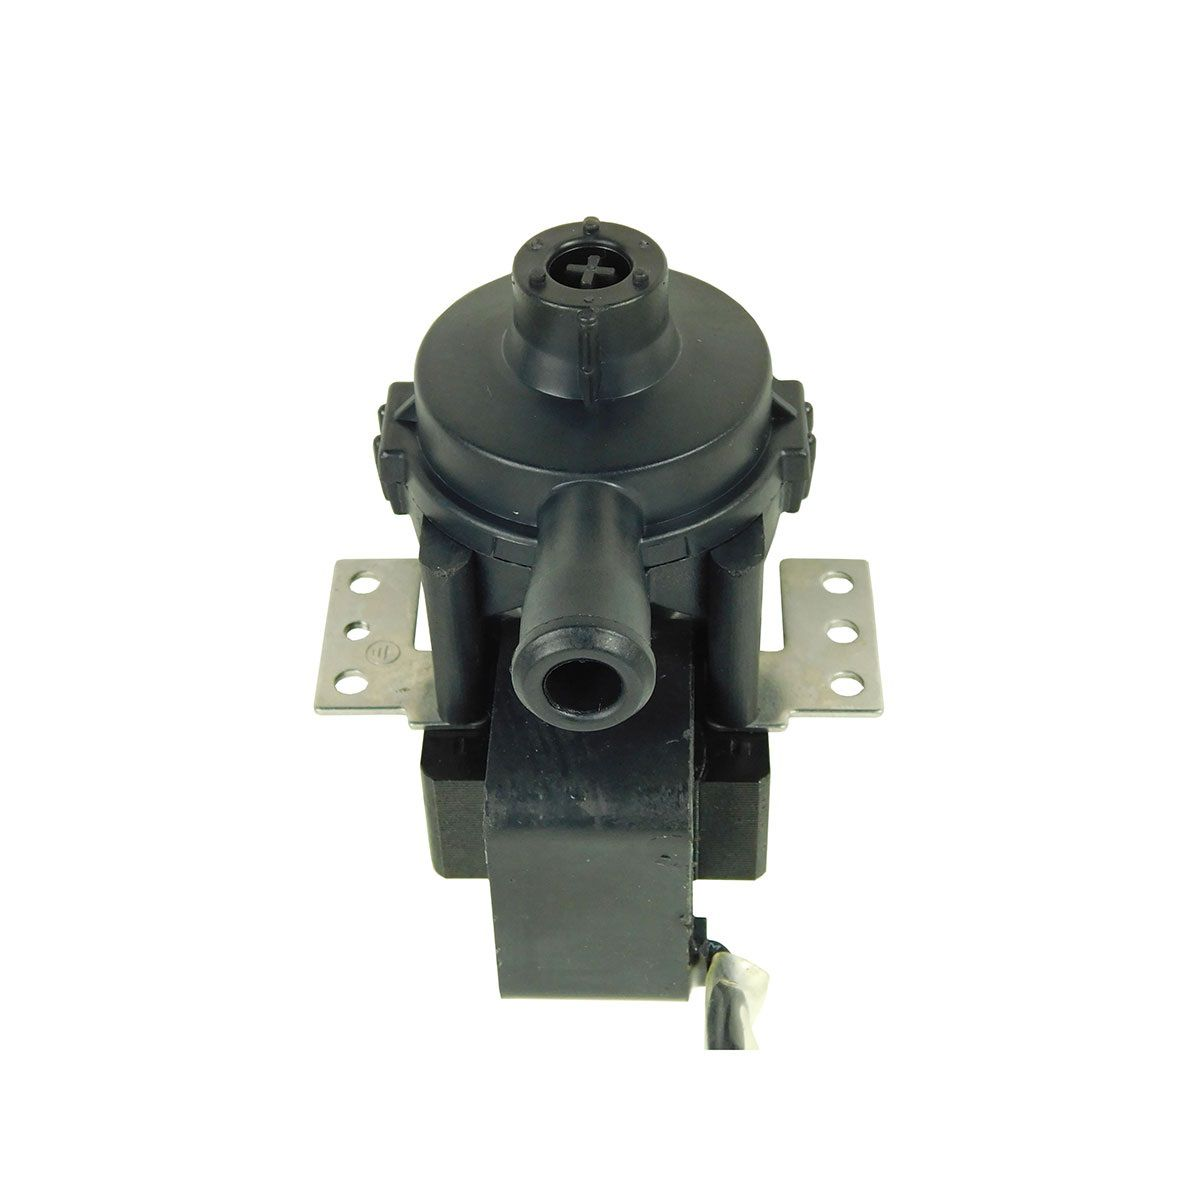 Bomba de Dreno Fan Coil Cassete Hidrônico Midea 202400600201